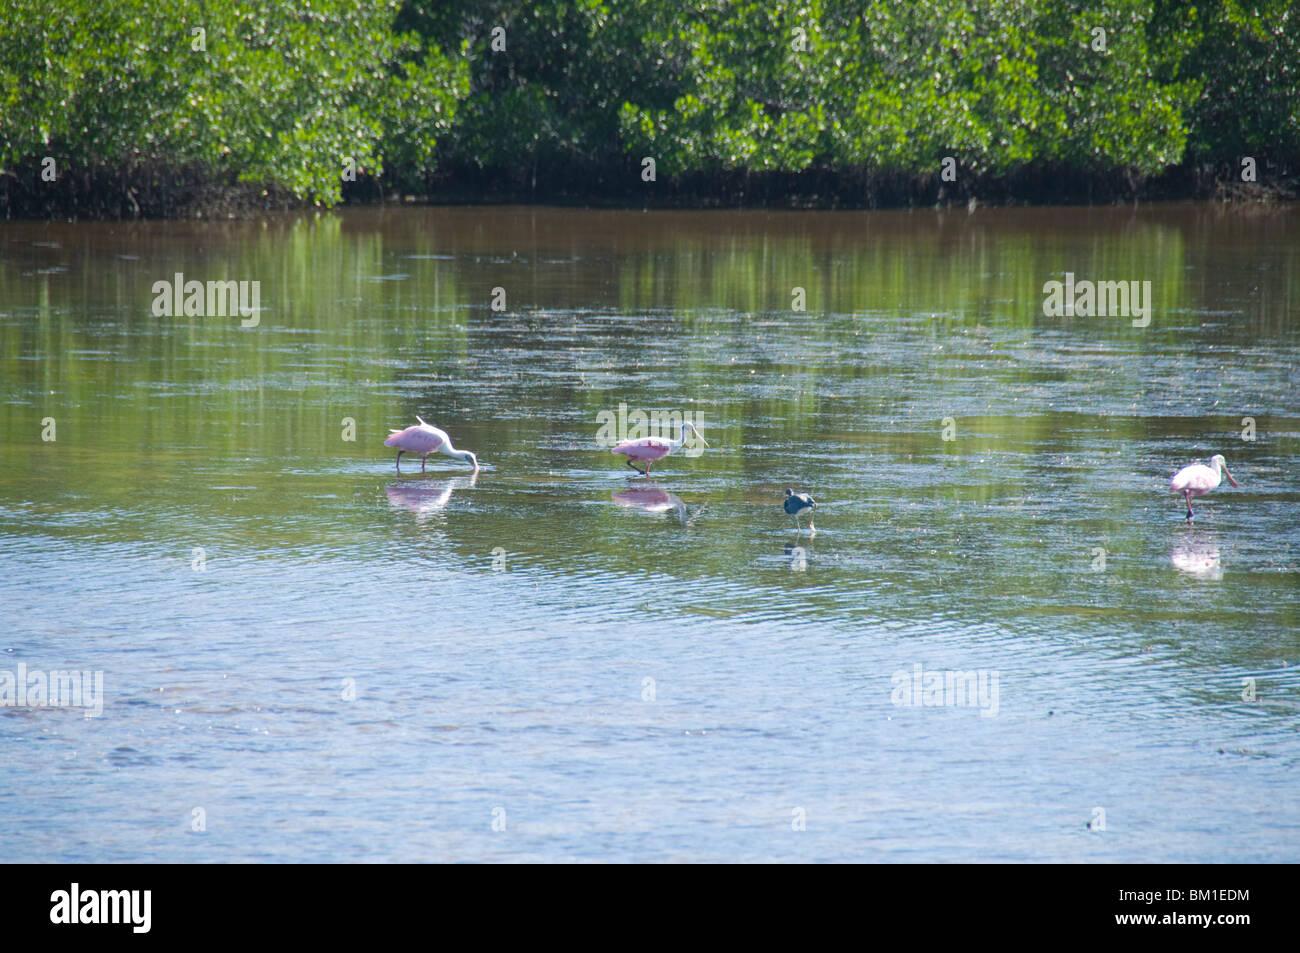 Roseate spoonbills, J.N. 'Ding' Darling Wildlife Reserve, Sanibel Island, Gulf Coast, Florida, United States - Stock Image